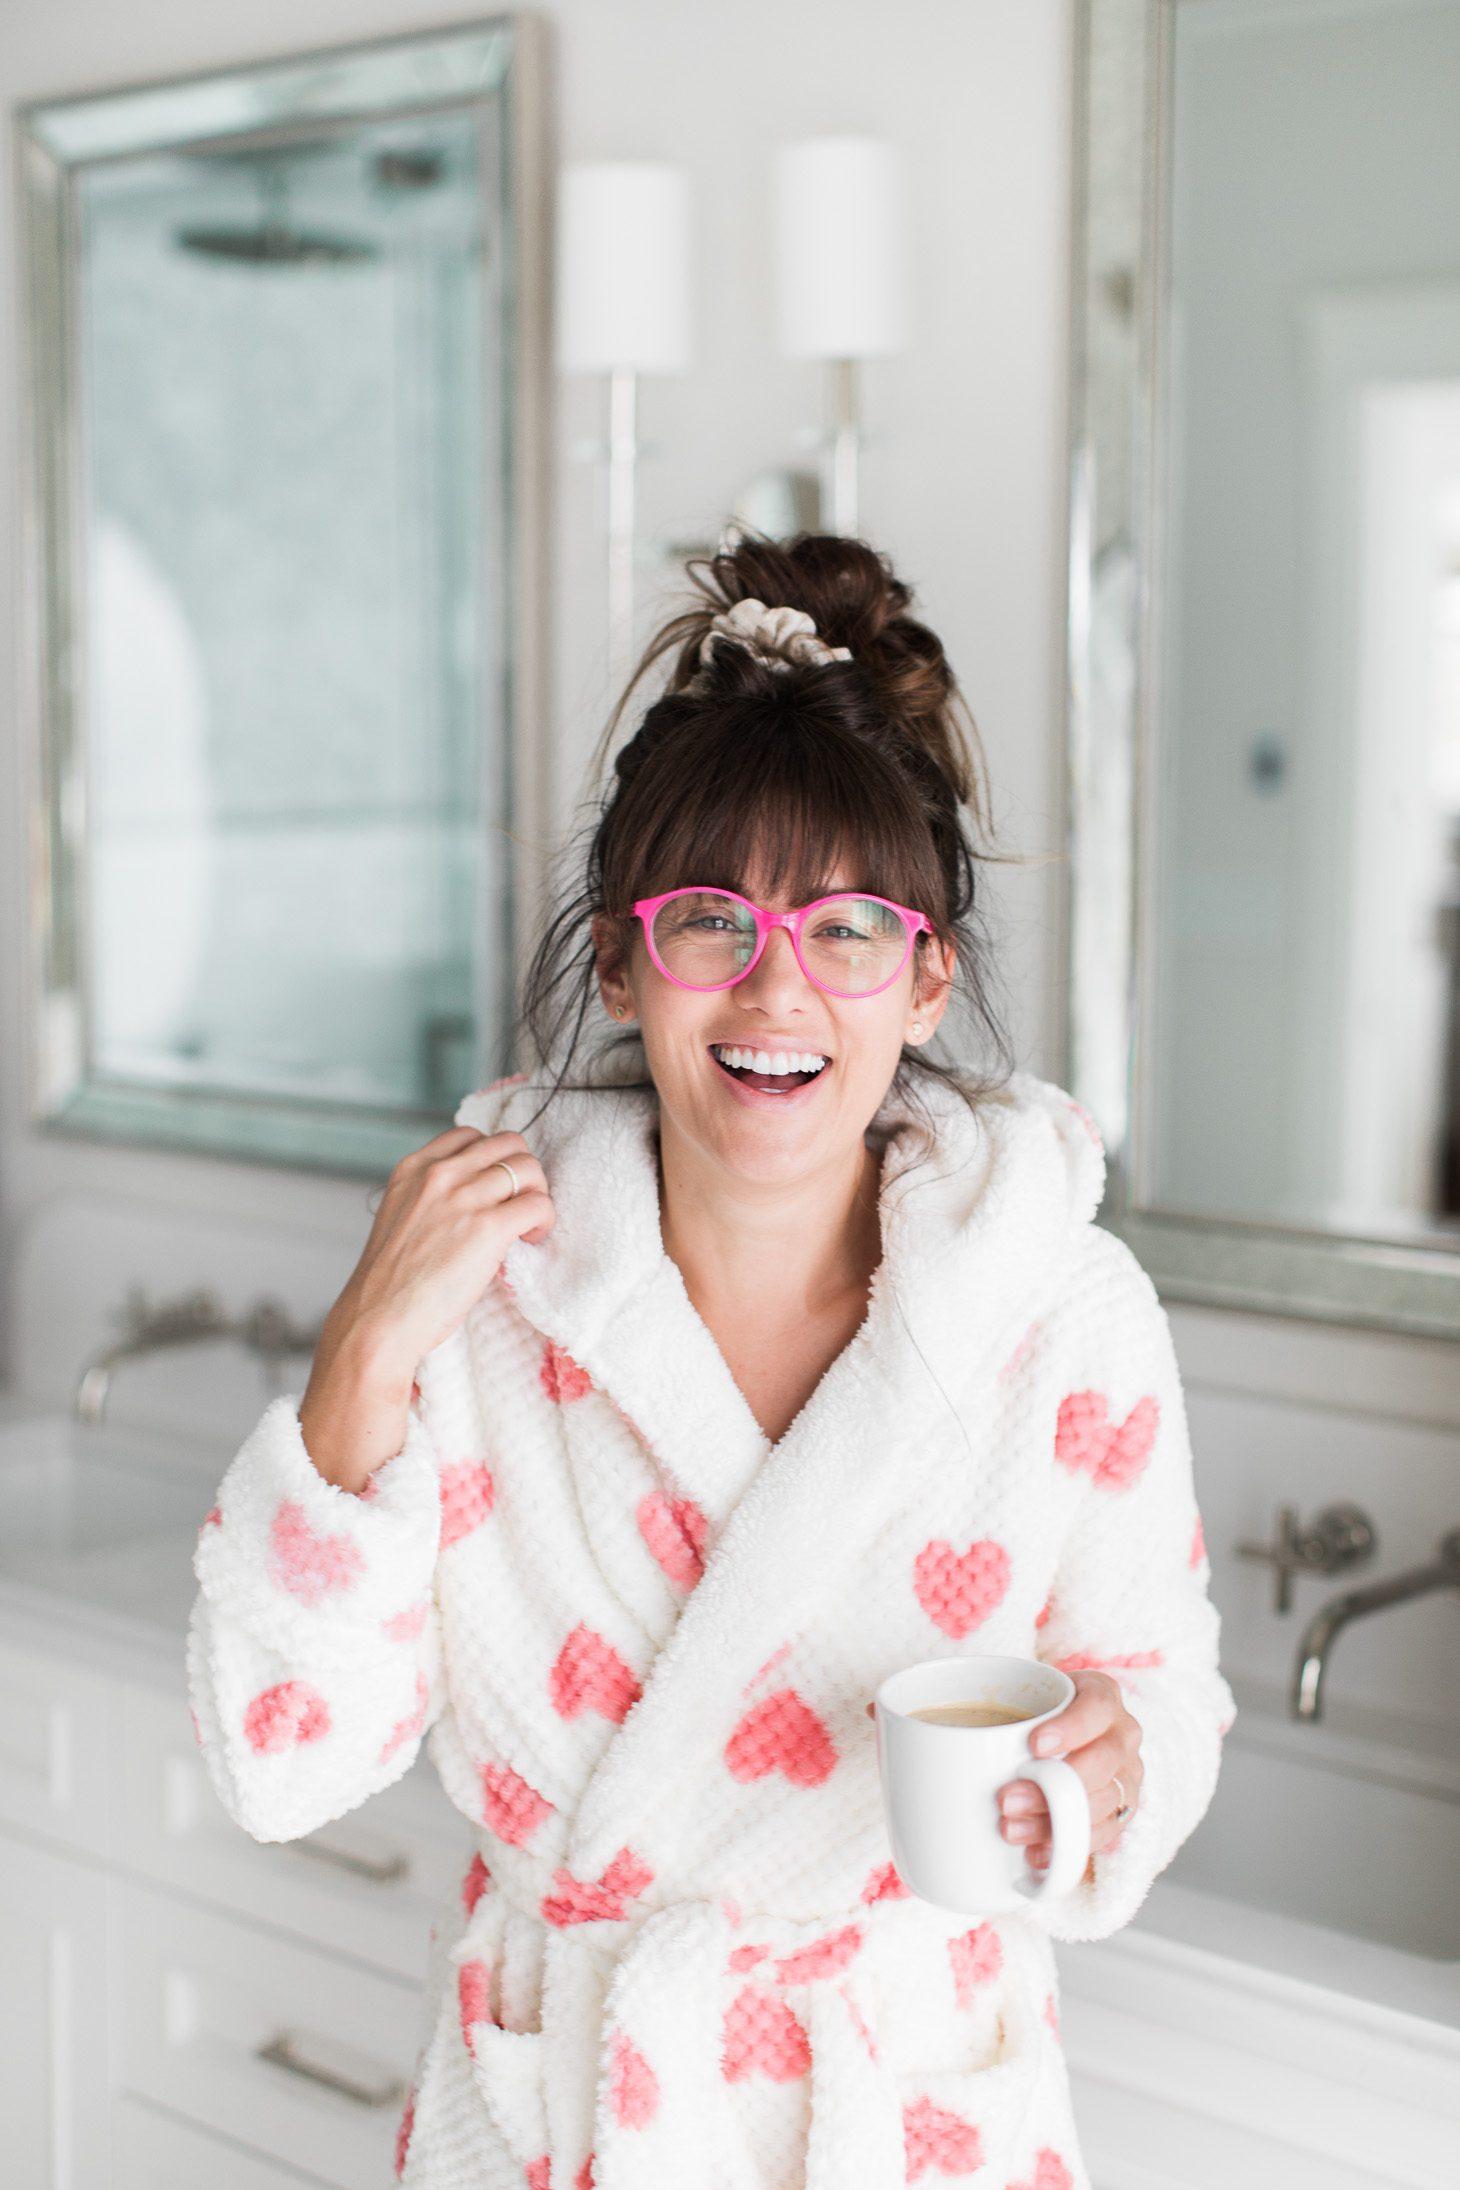 Jillian Harris Valentine's Day Outfits